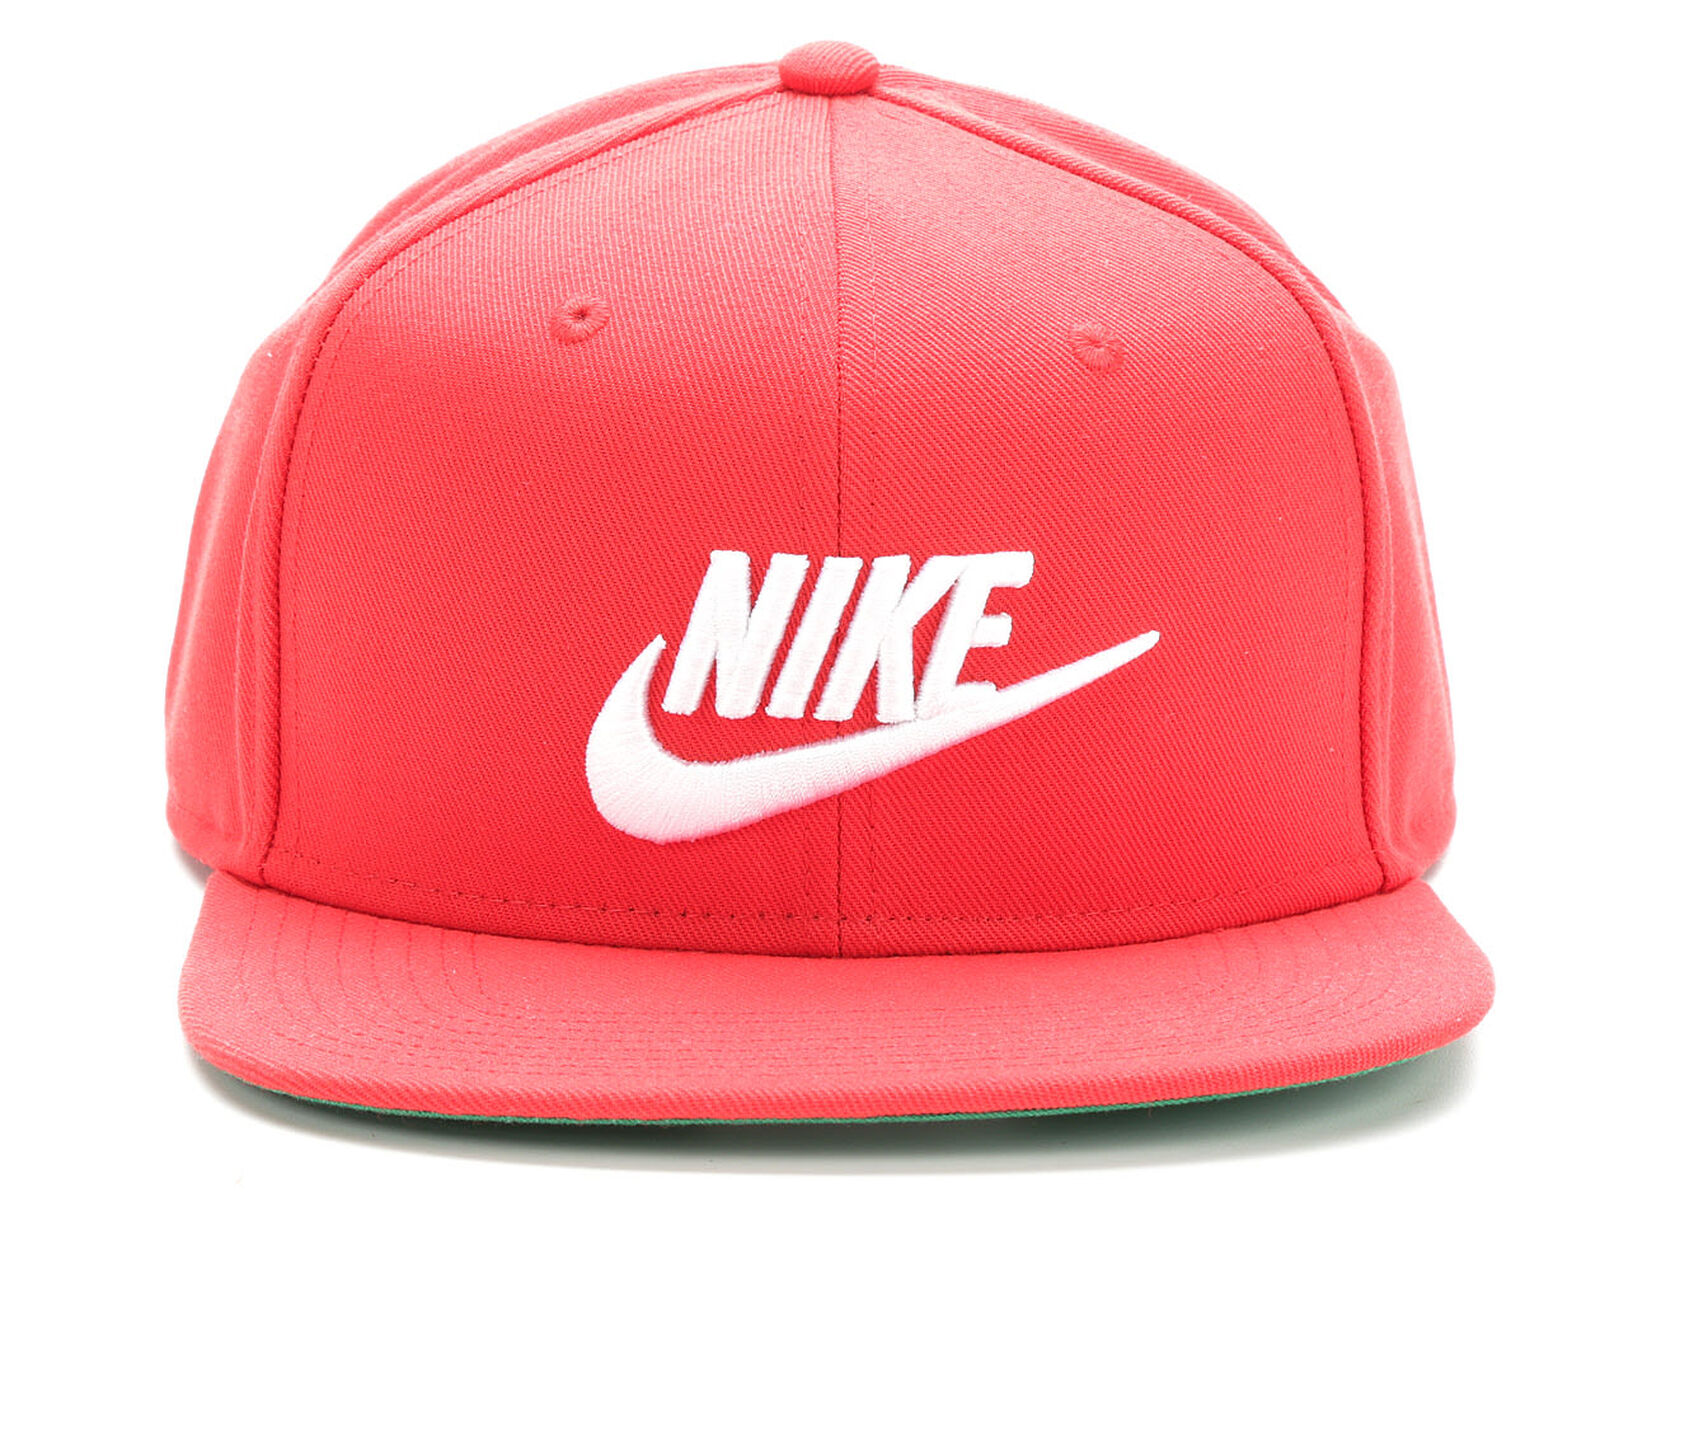 0bc1c550264 Nike Futura Pro Flatbill Hat. Carousel Controls